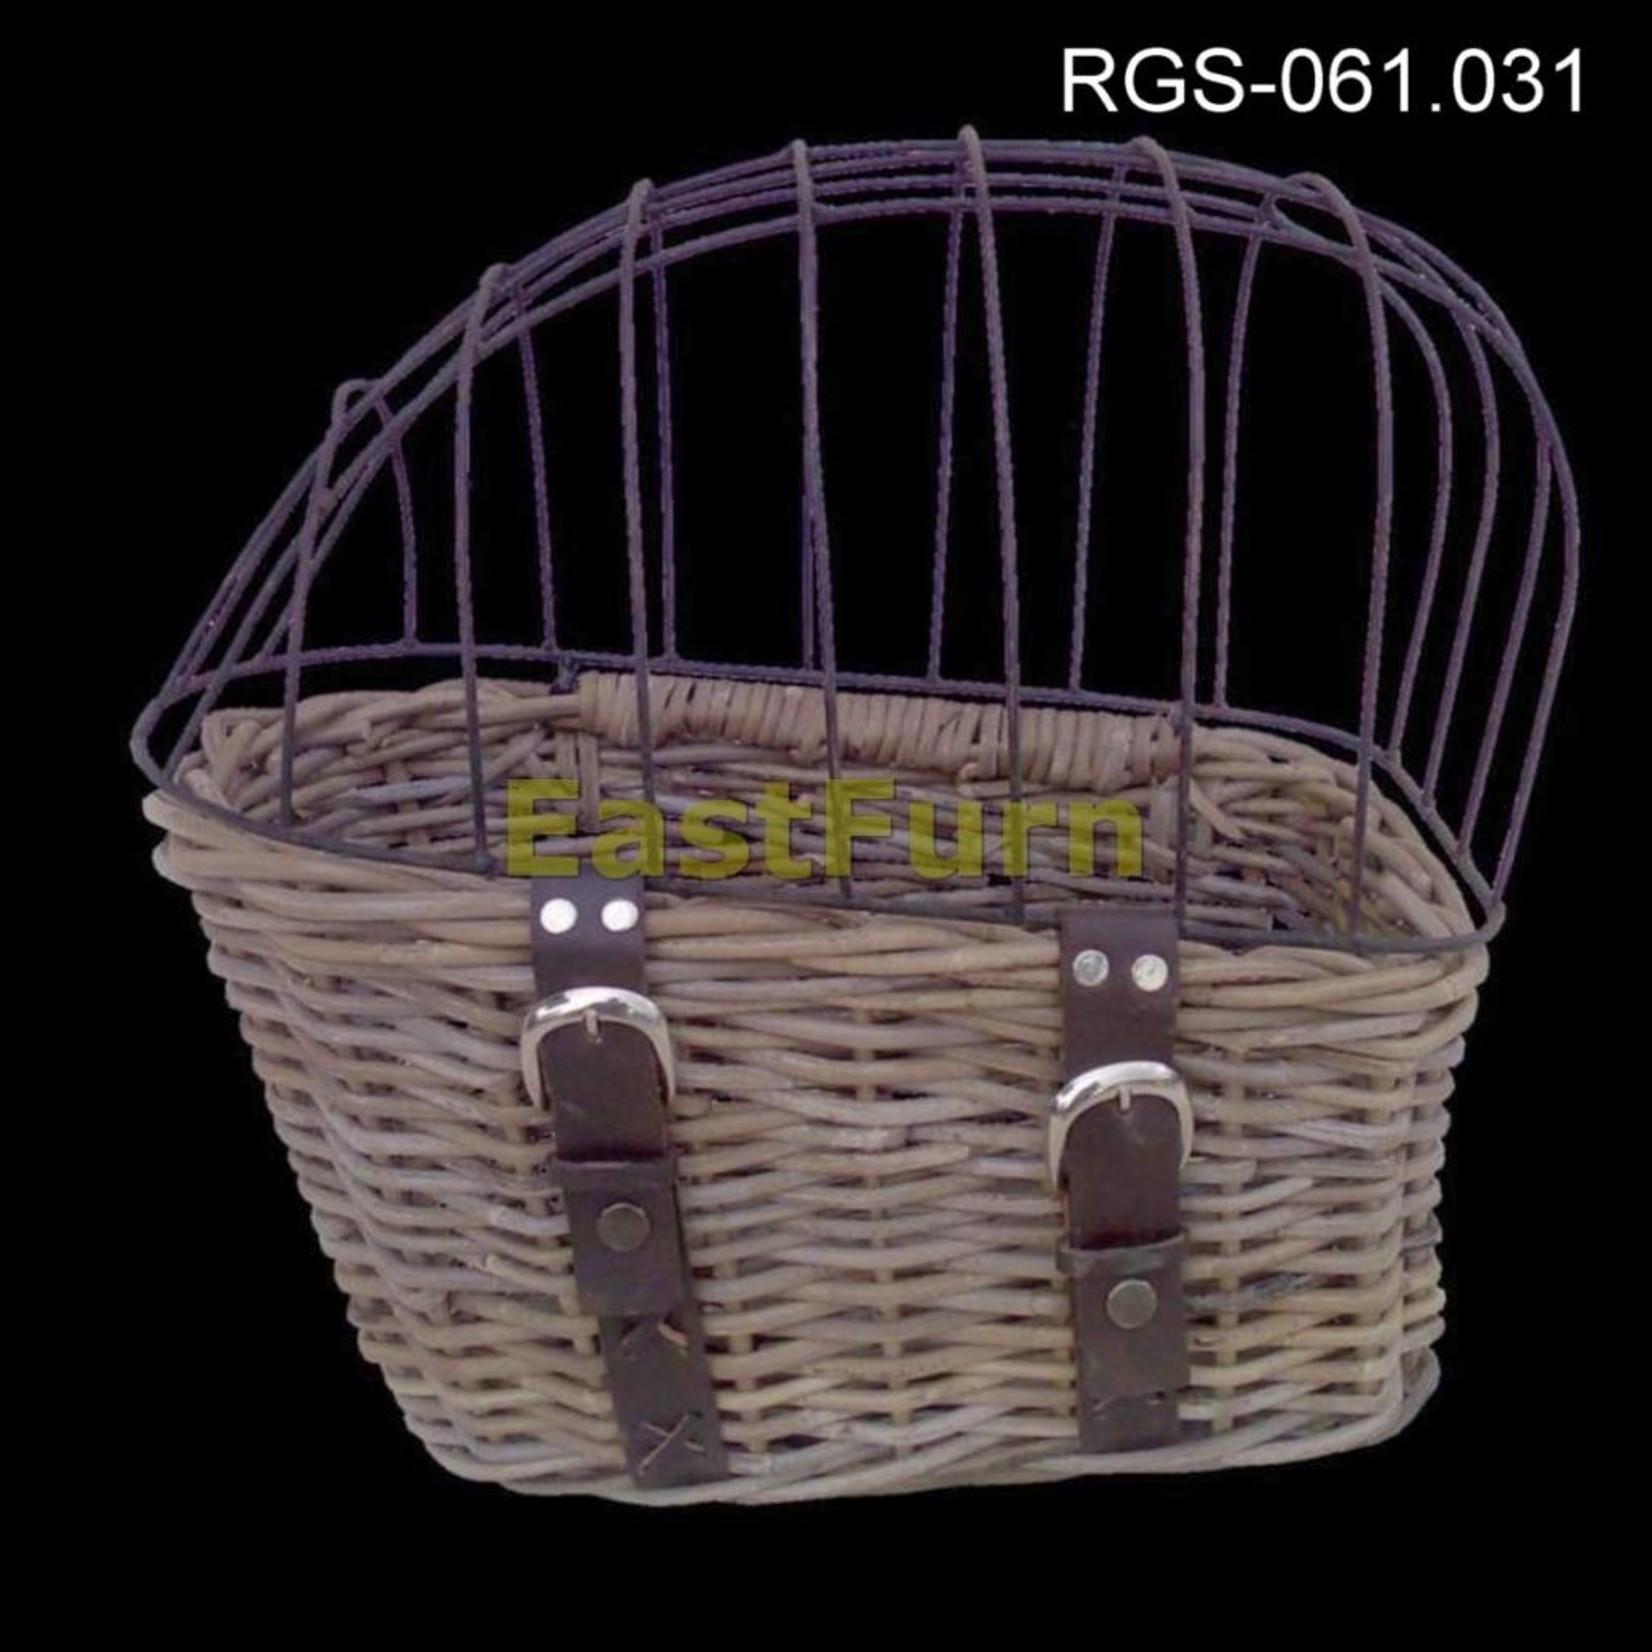 RGS-061